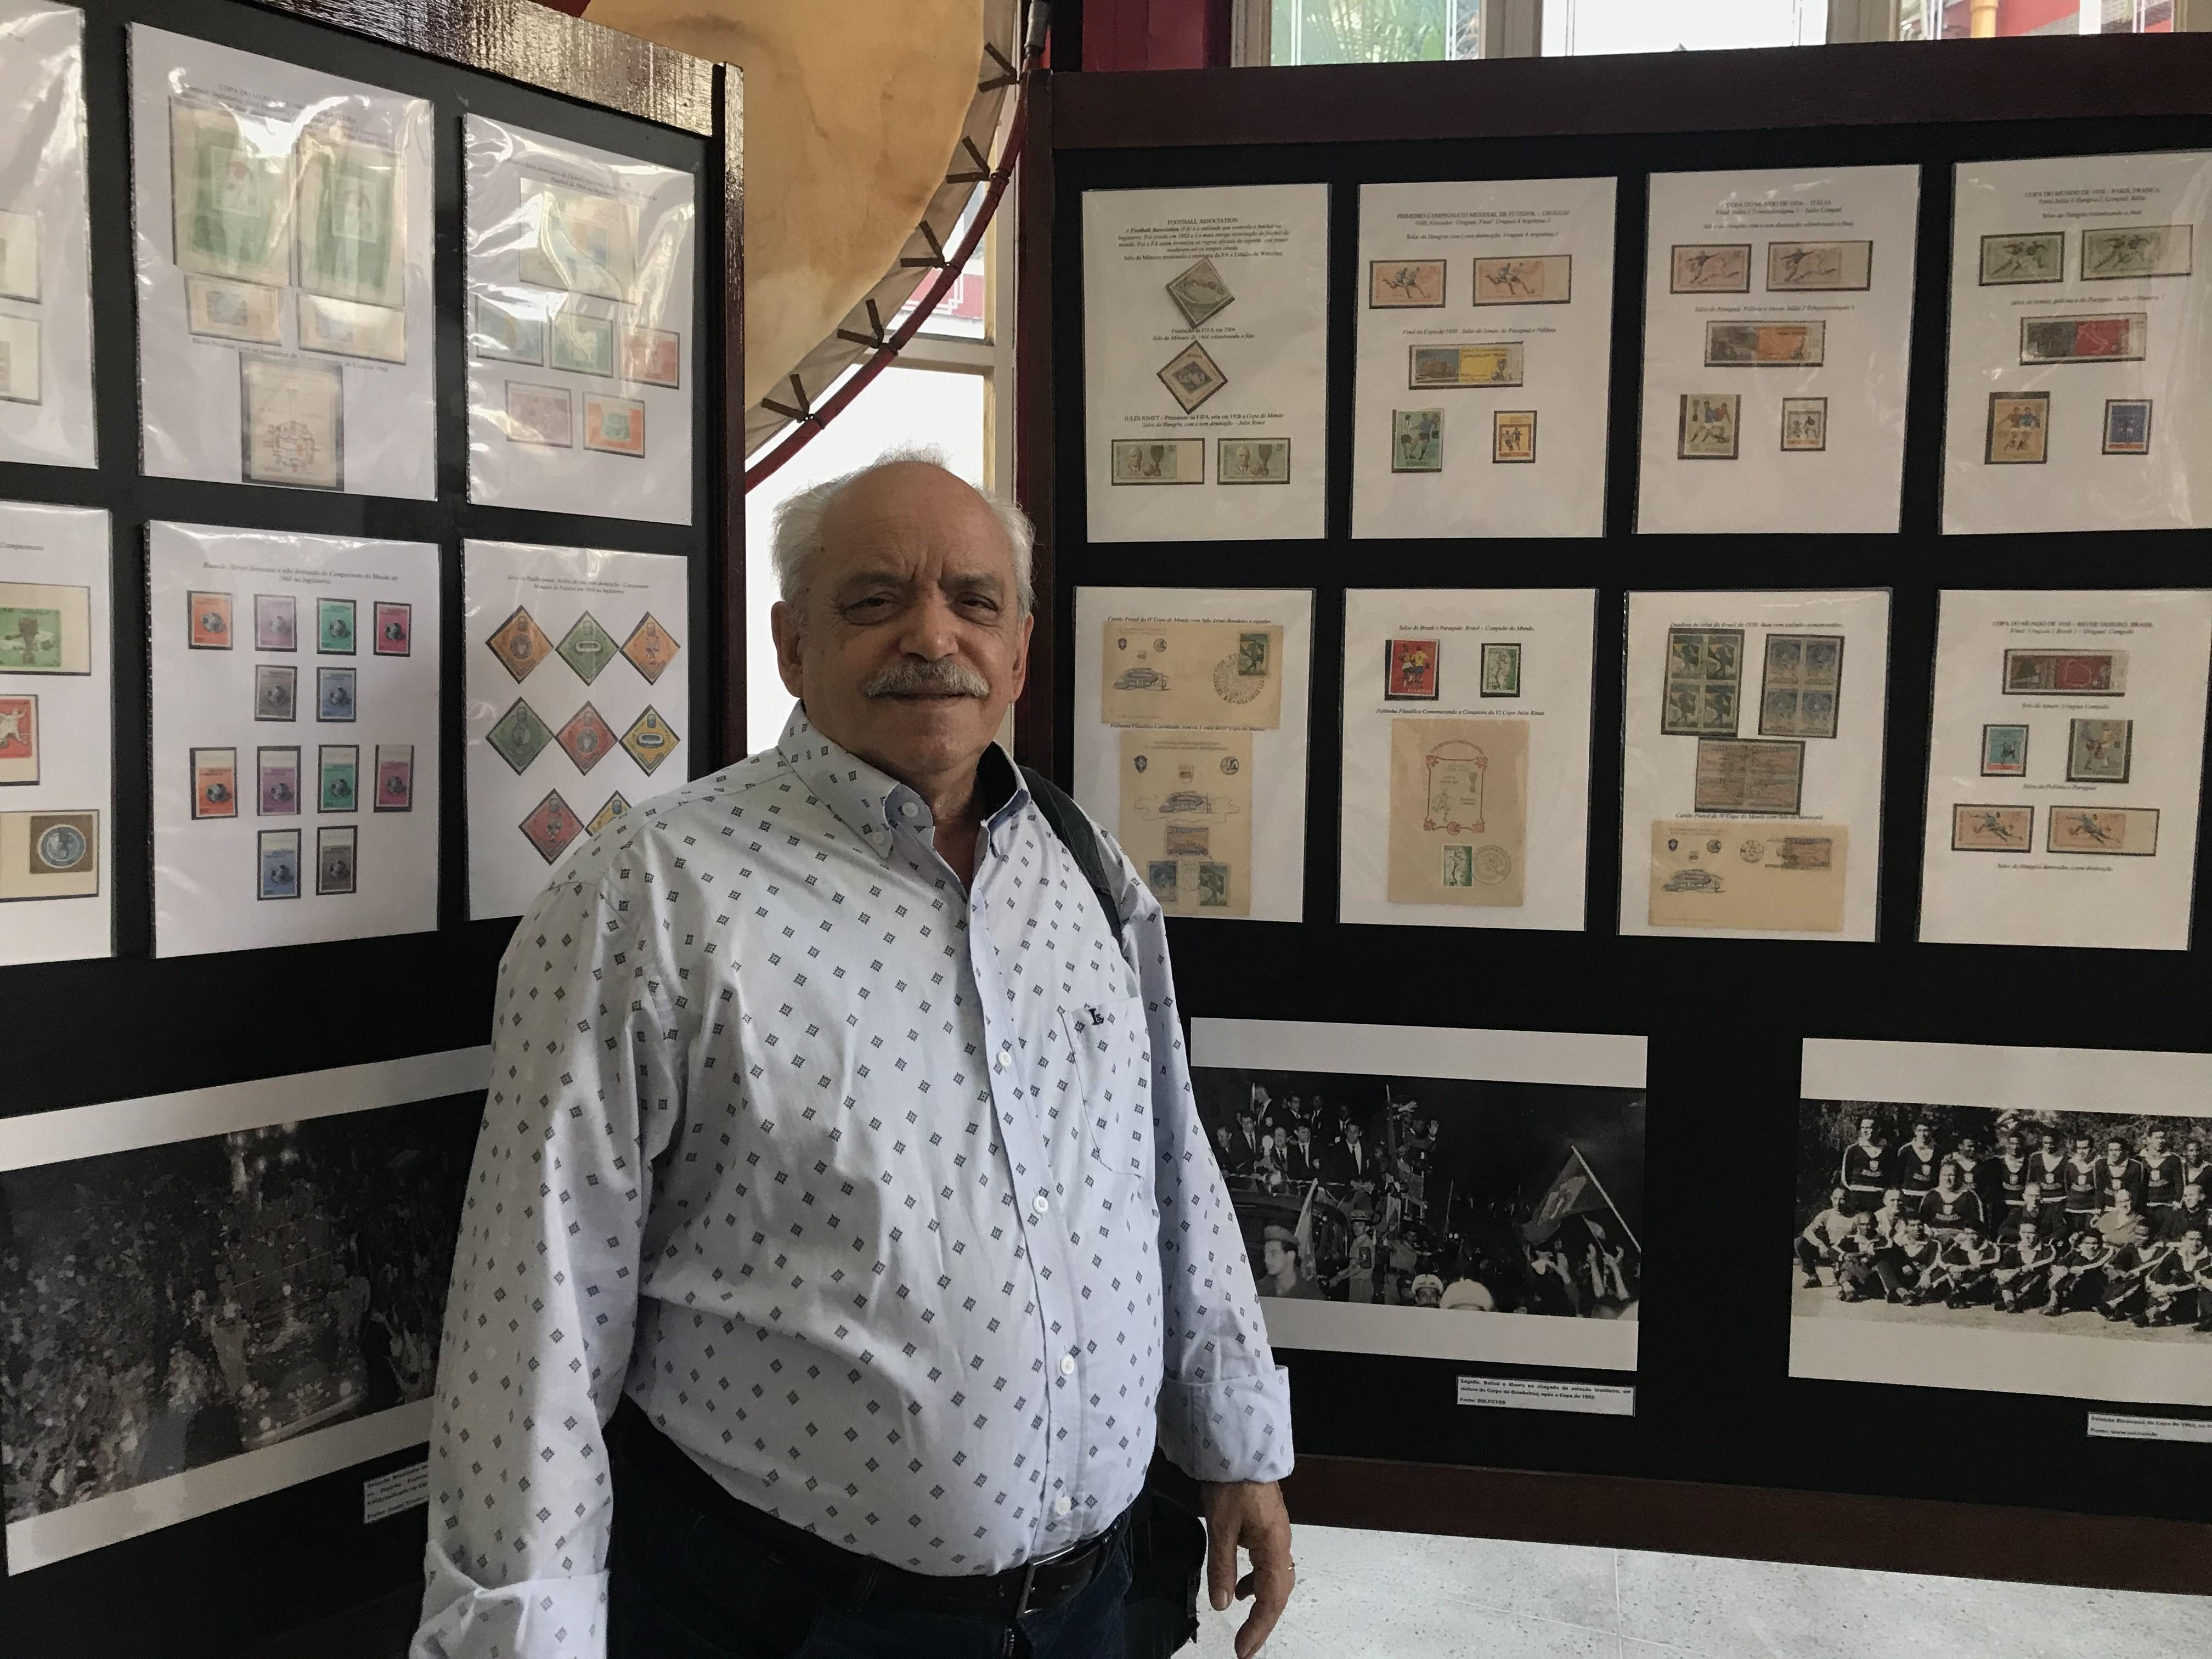 Antonio Joaquim Veloso, 76 anos, geógrafo